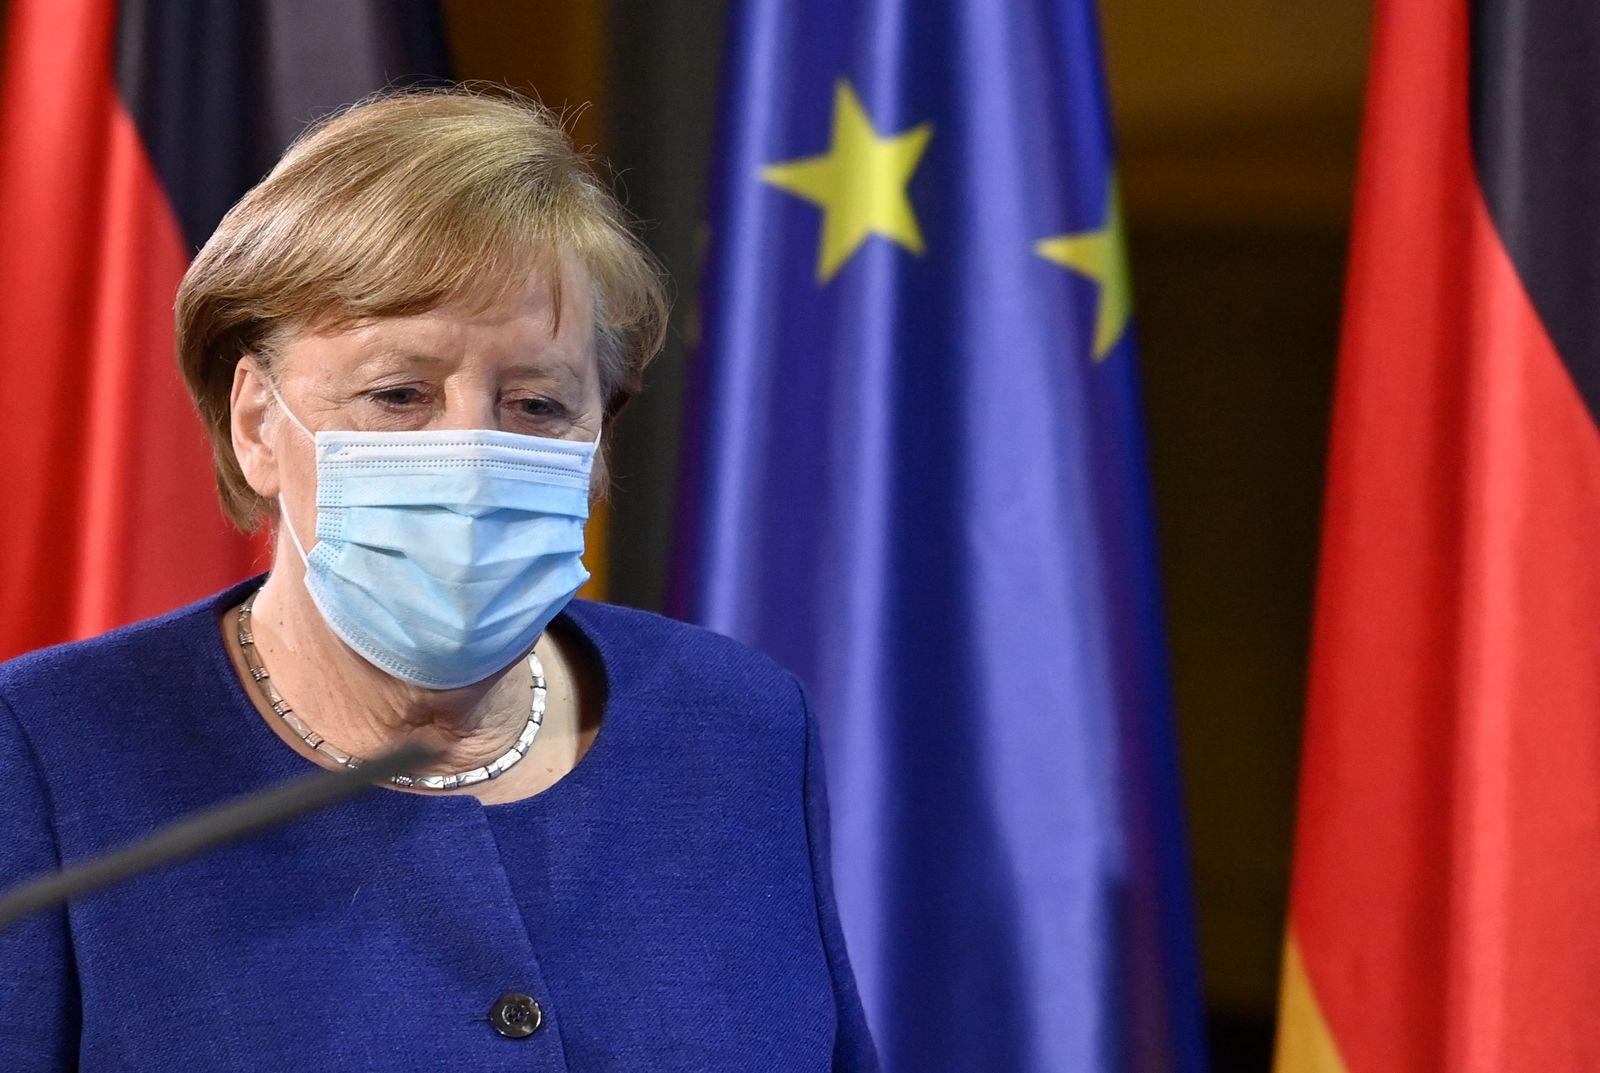 GERMANY-EU-POLITICS-MERKEL